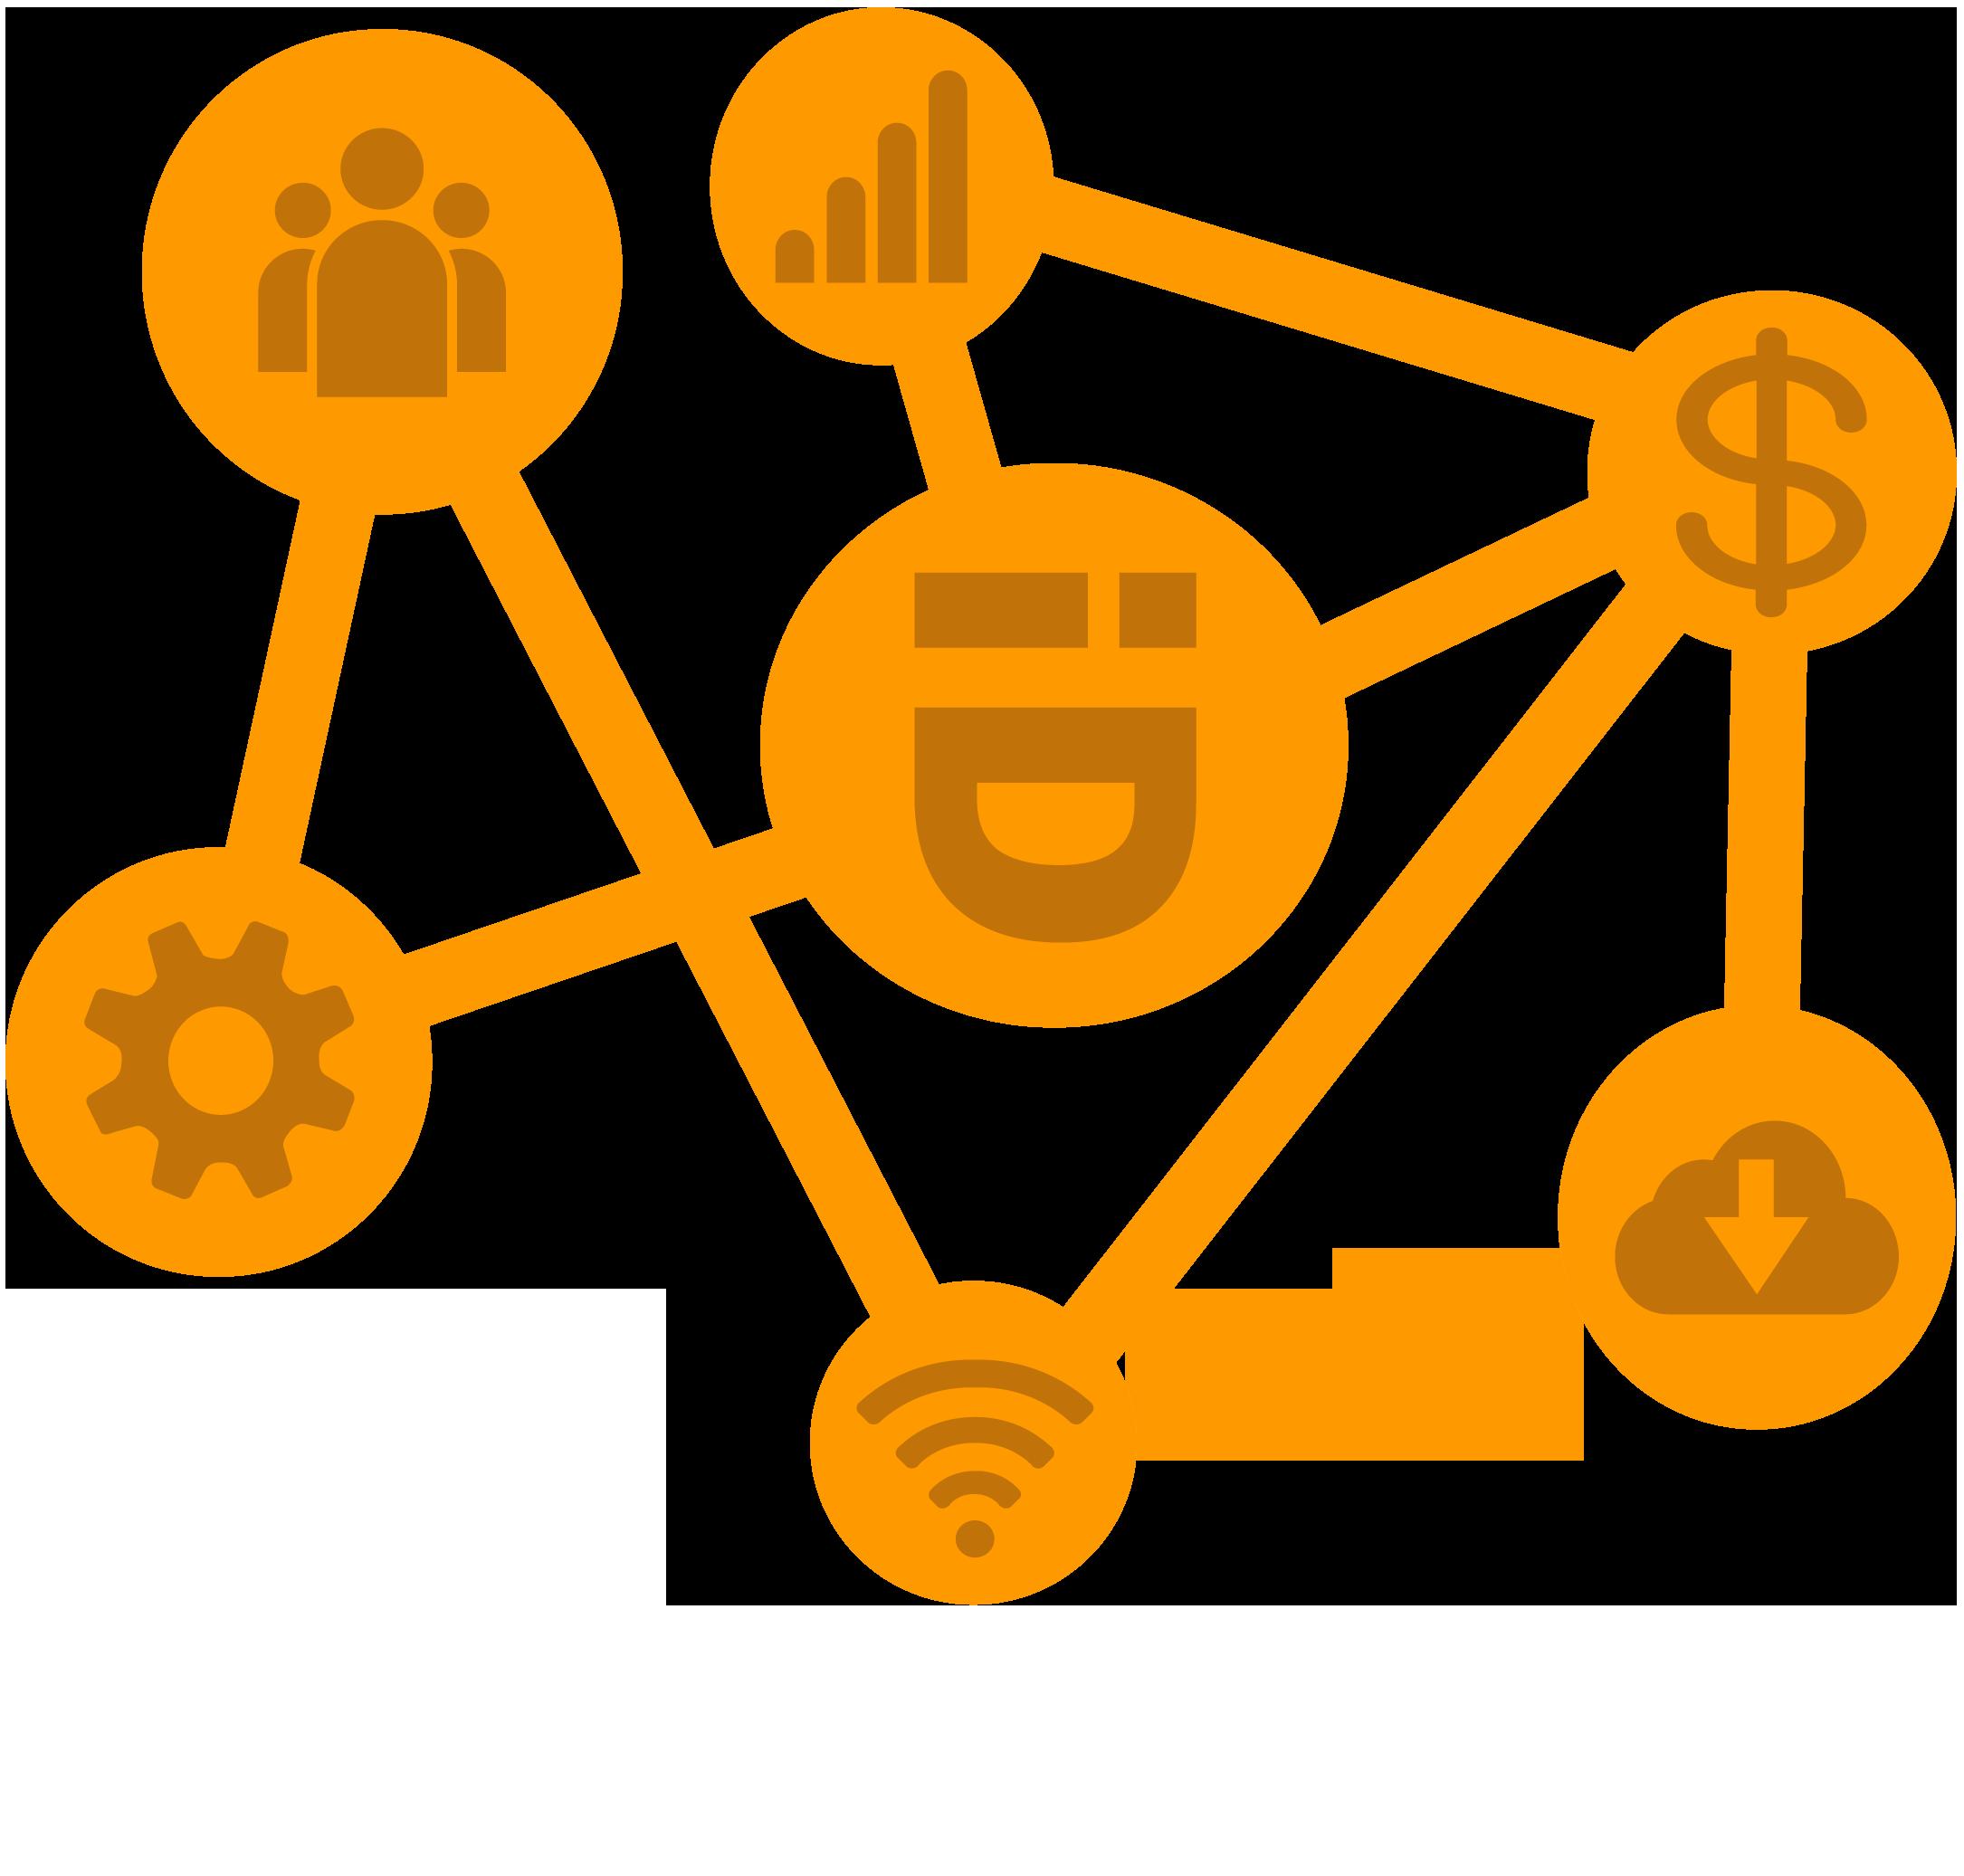 Token Sharing Economy Strategy